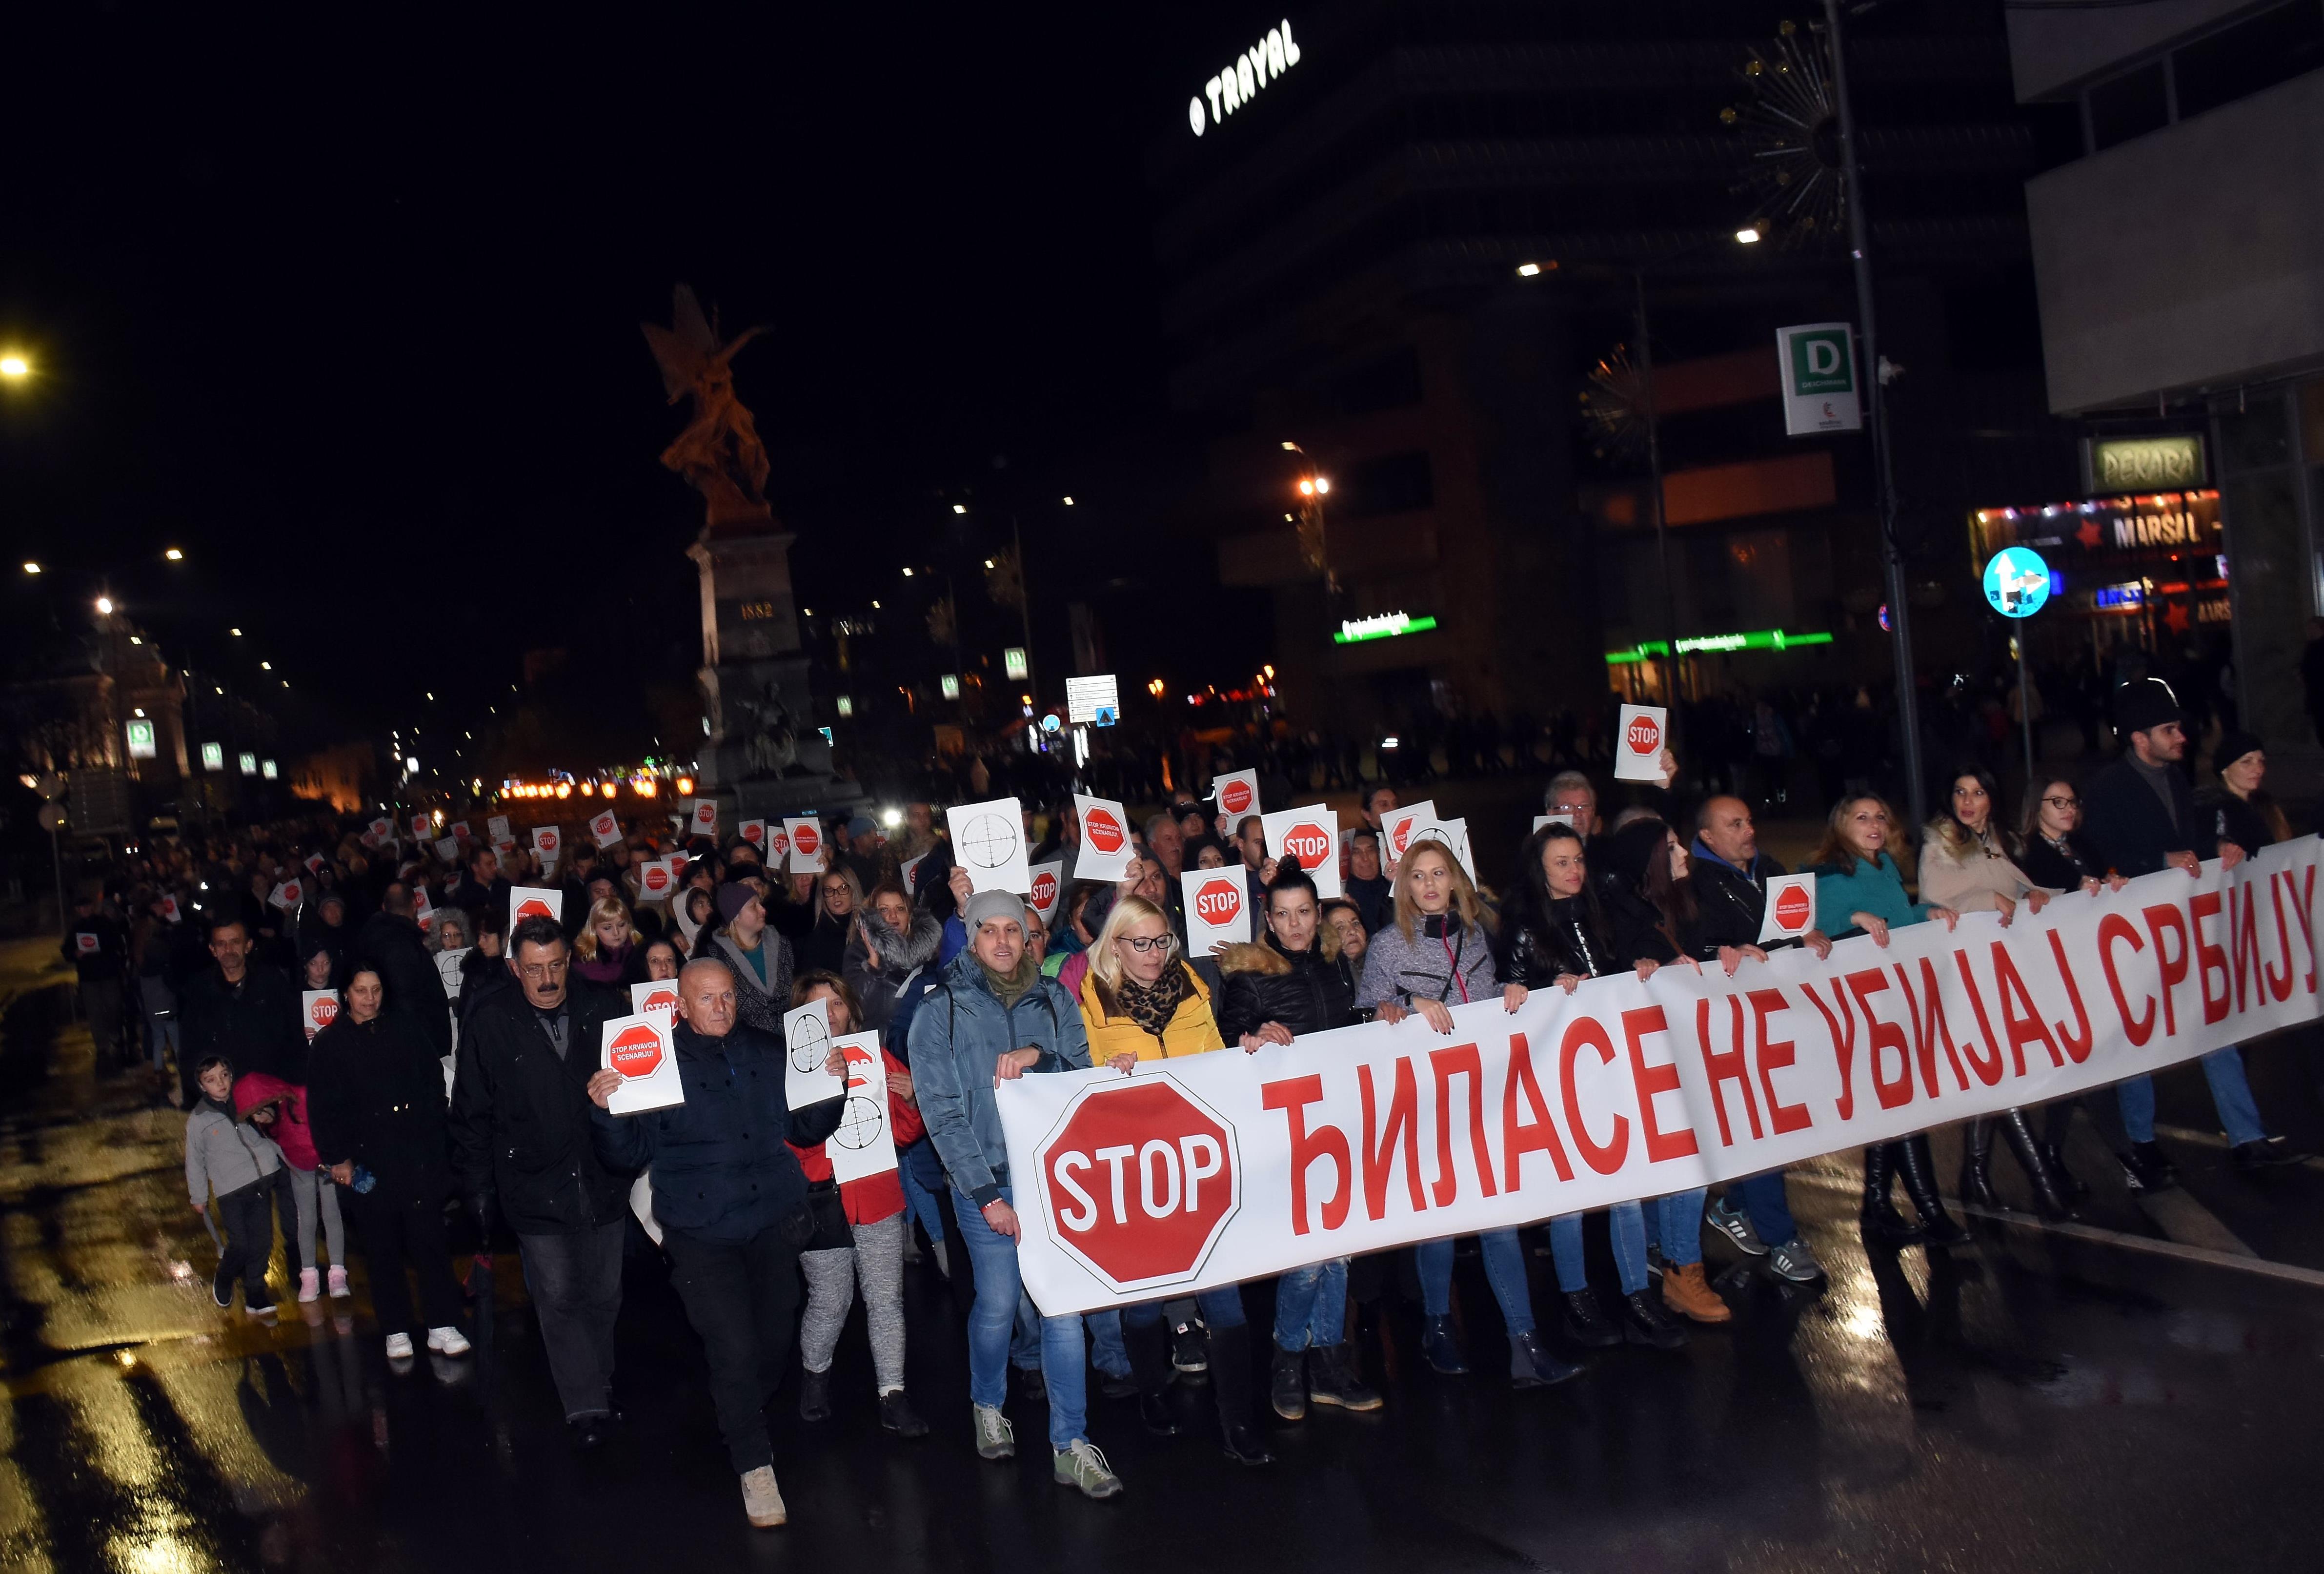 Građani Kruševca se spontano organizovali u znak protesta zbog naslovnih strana na kojima je predsednik Vučić prikazan kao meta